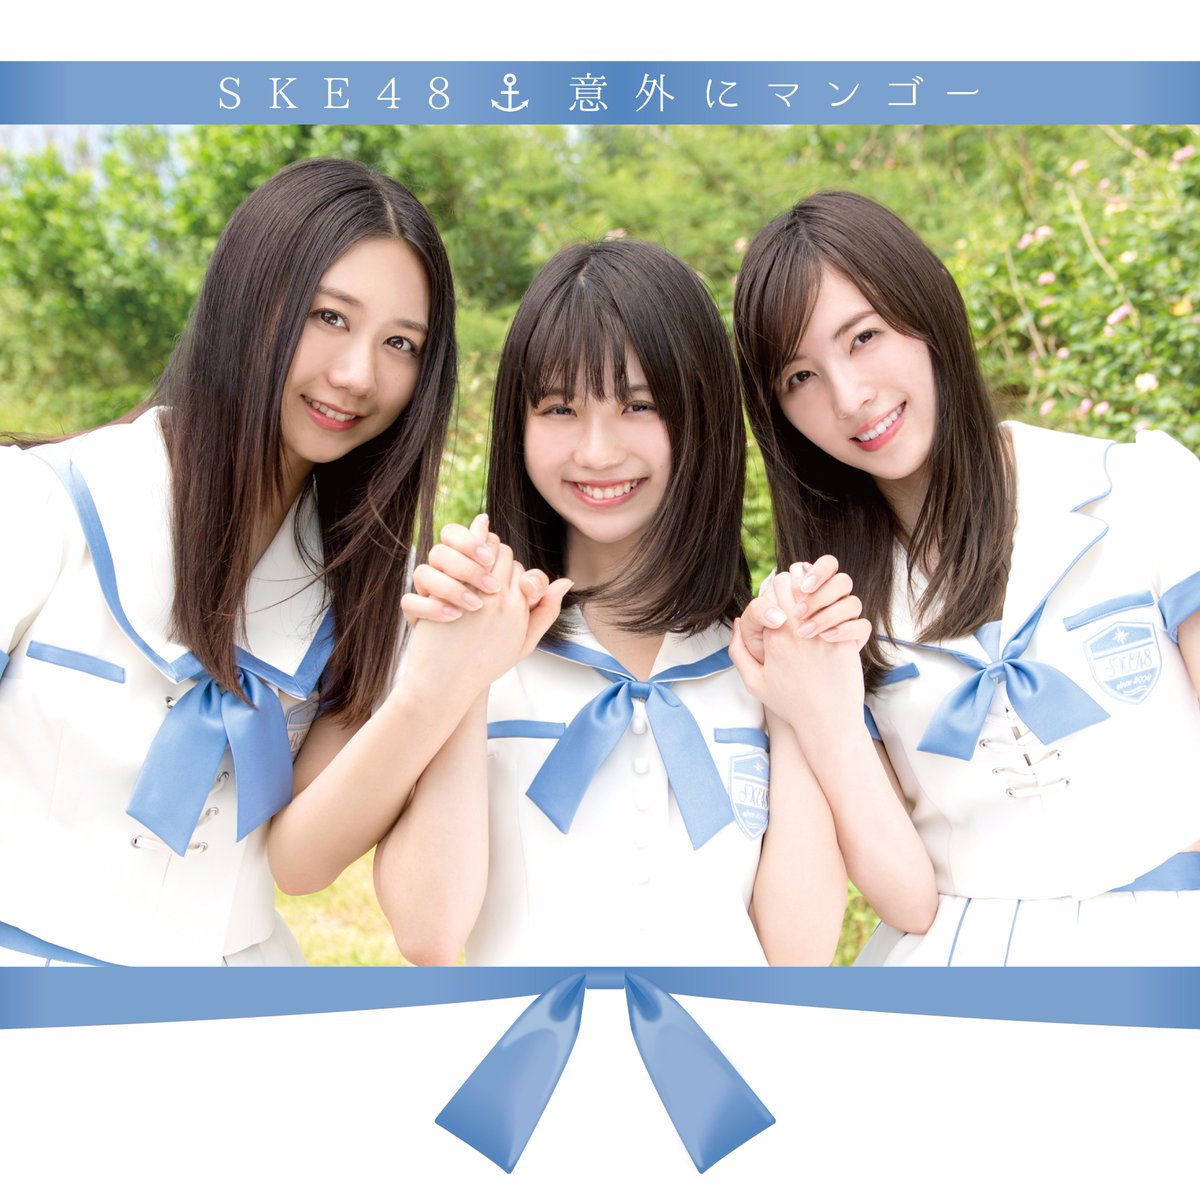 SKE48、「意外にマンゴー」通常盤は白×ブルーのセーラー服 oricon.co.jp/news/2…